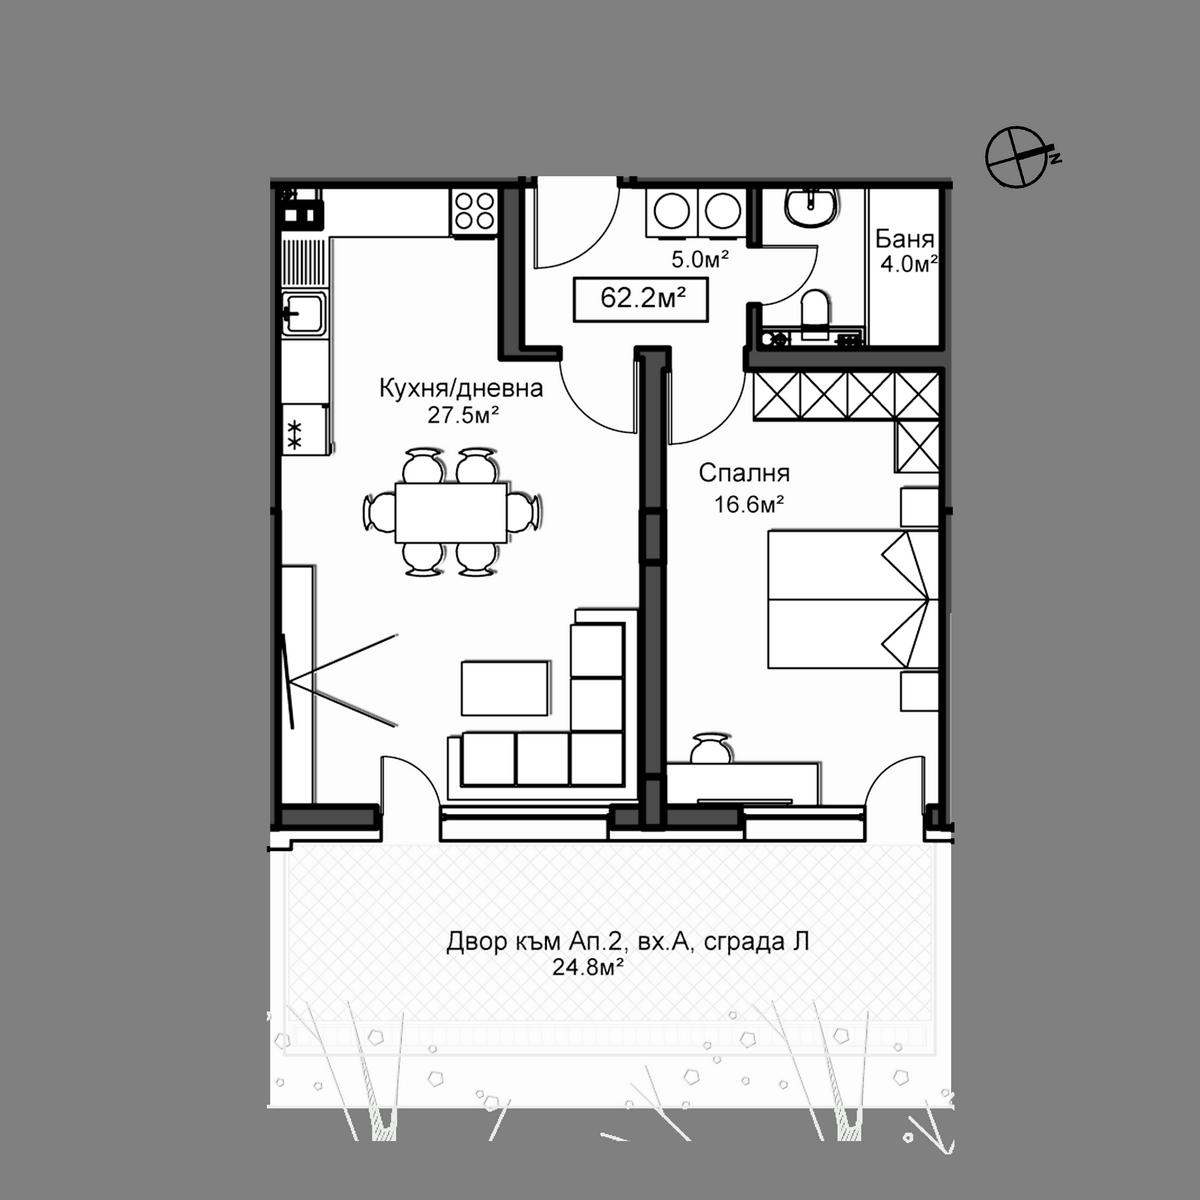 Продава апартамент ново строителство - Апартамент А2